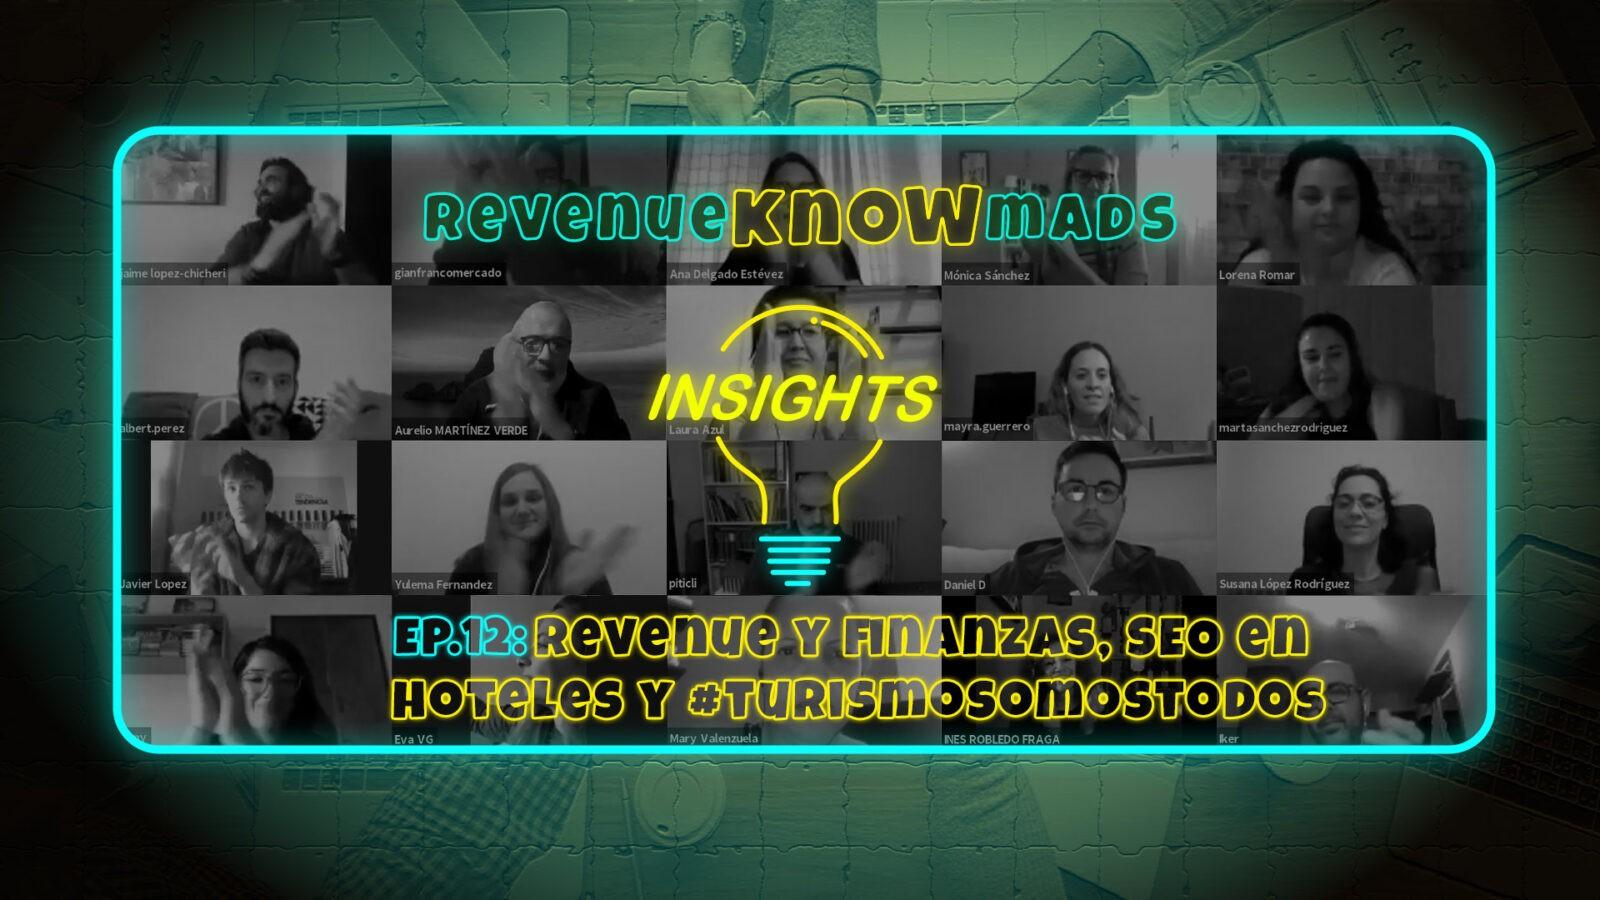 RevenueKnowmads Insights - Ep.12